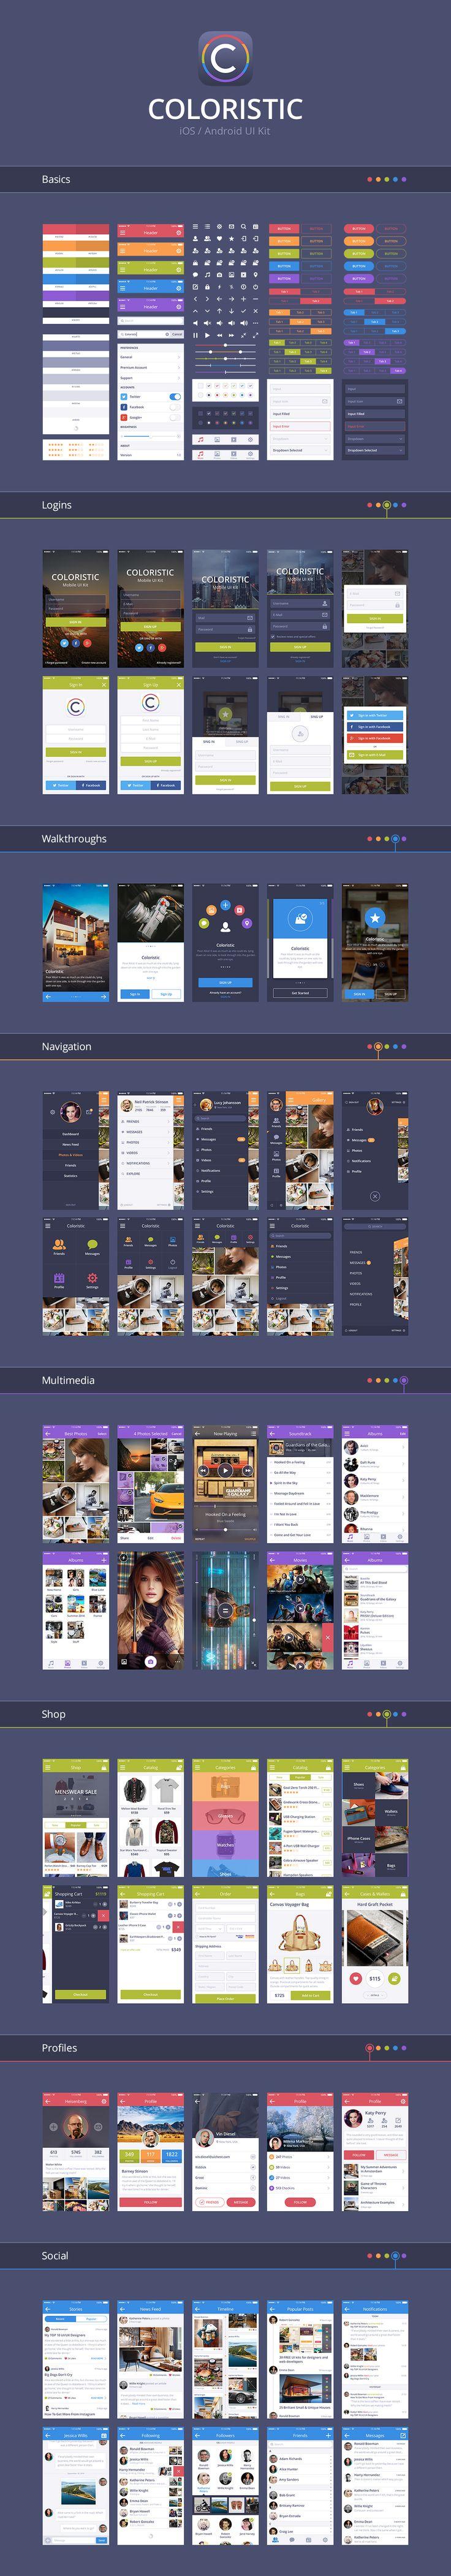 app - Coloristic UI Kit